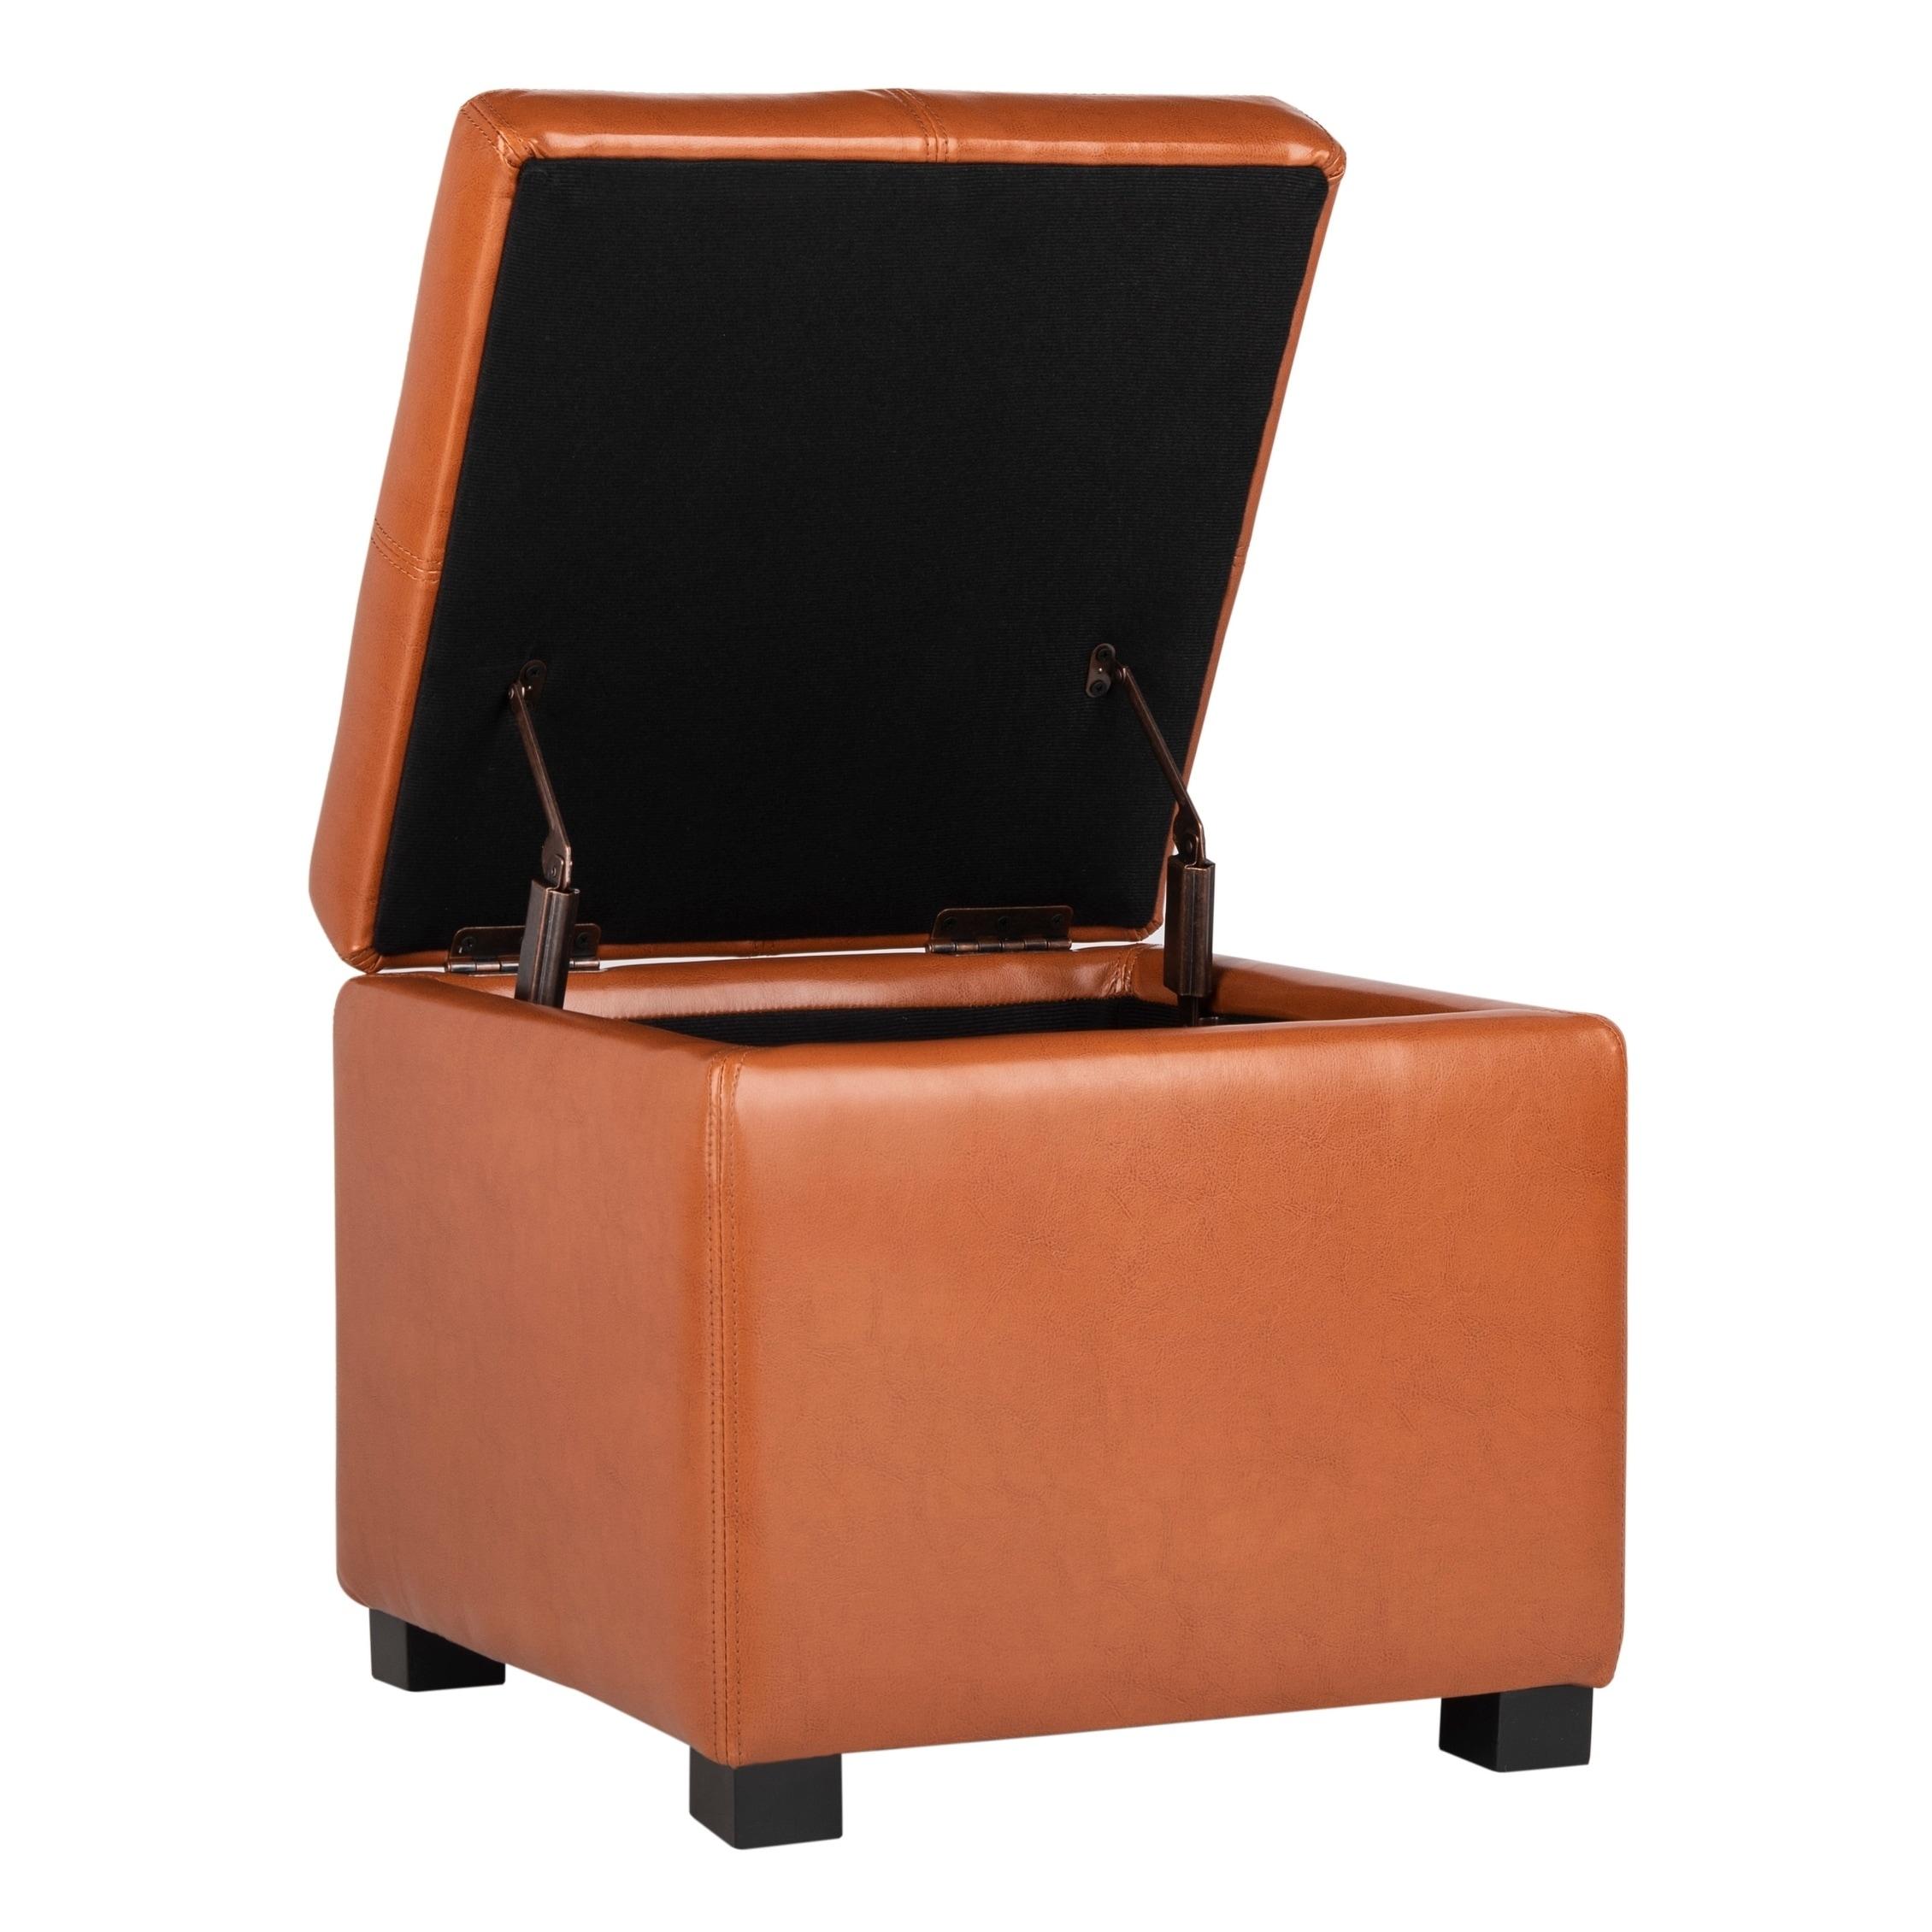 Strange Safavieh Broadway Saddle Leather Storage Ottoman Squirreltailoven Fun Painted Chair Ideas Images Squirreltailovenorg